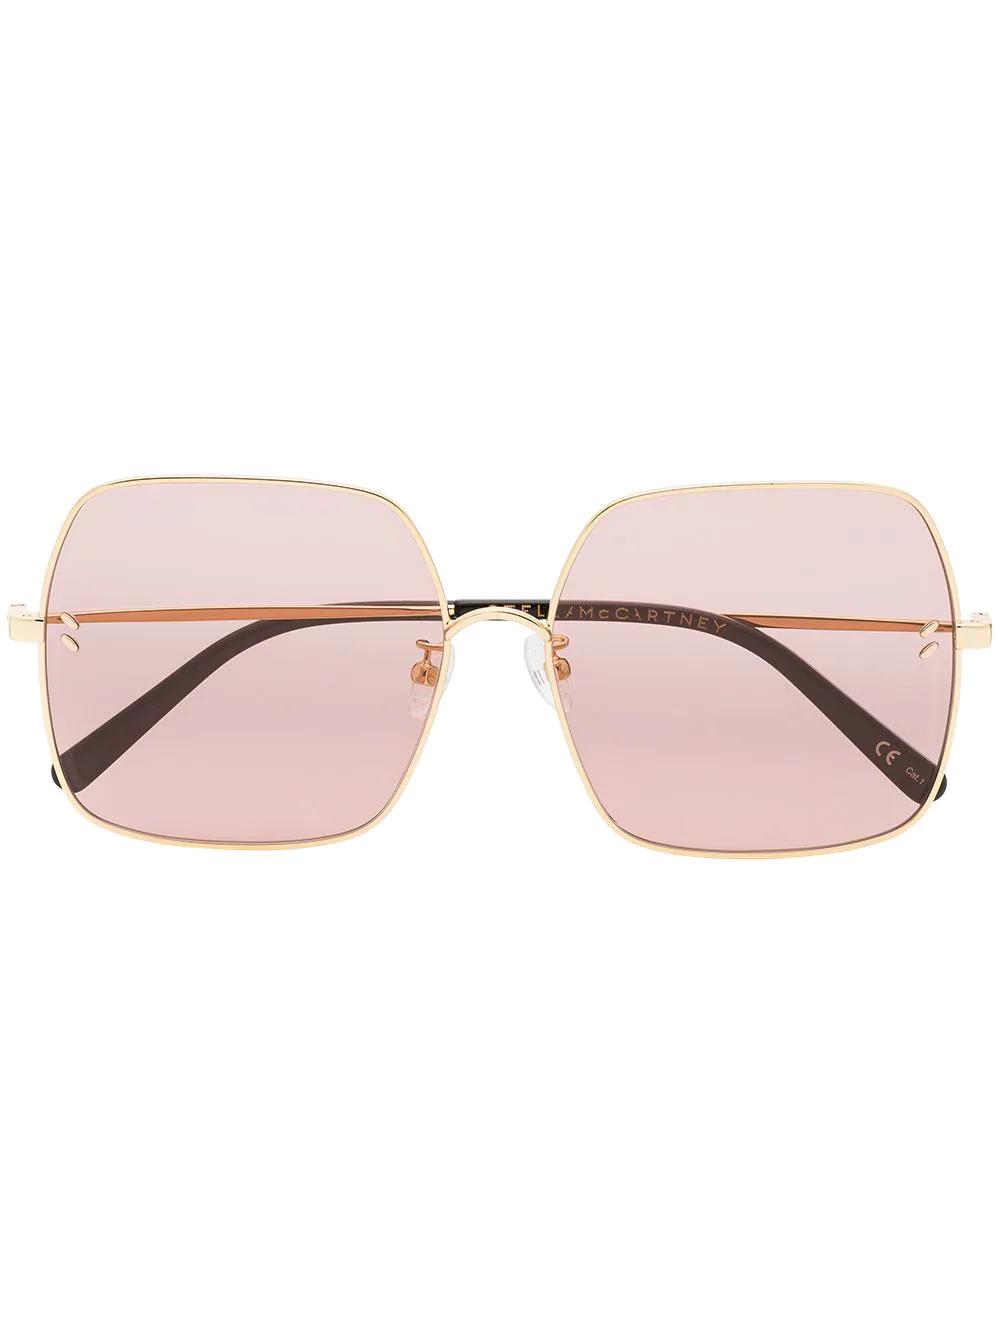 Stella McCartney | солнцезащитные очки в квадратной оправе | Clouty